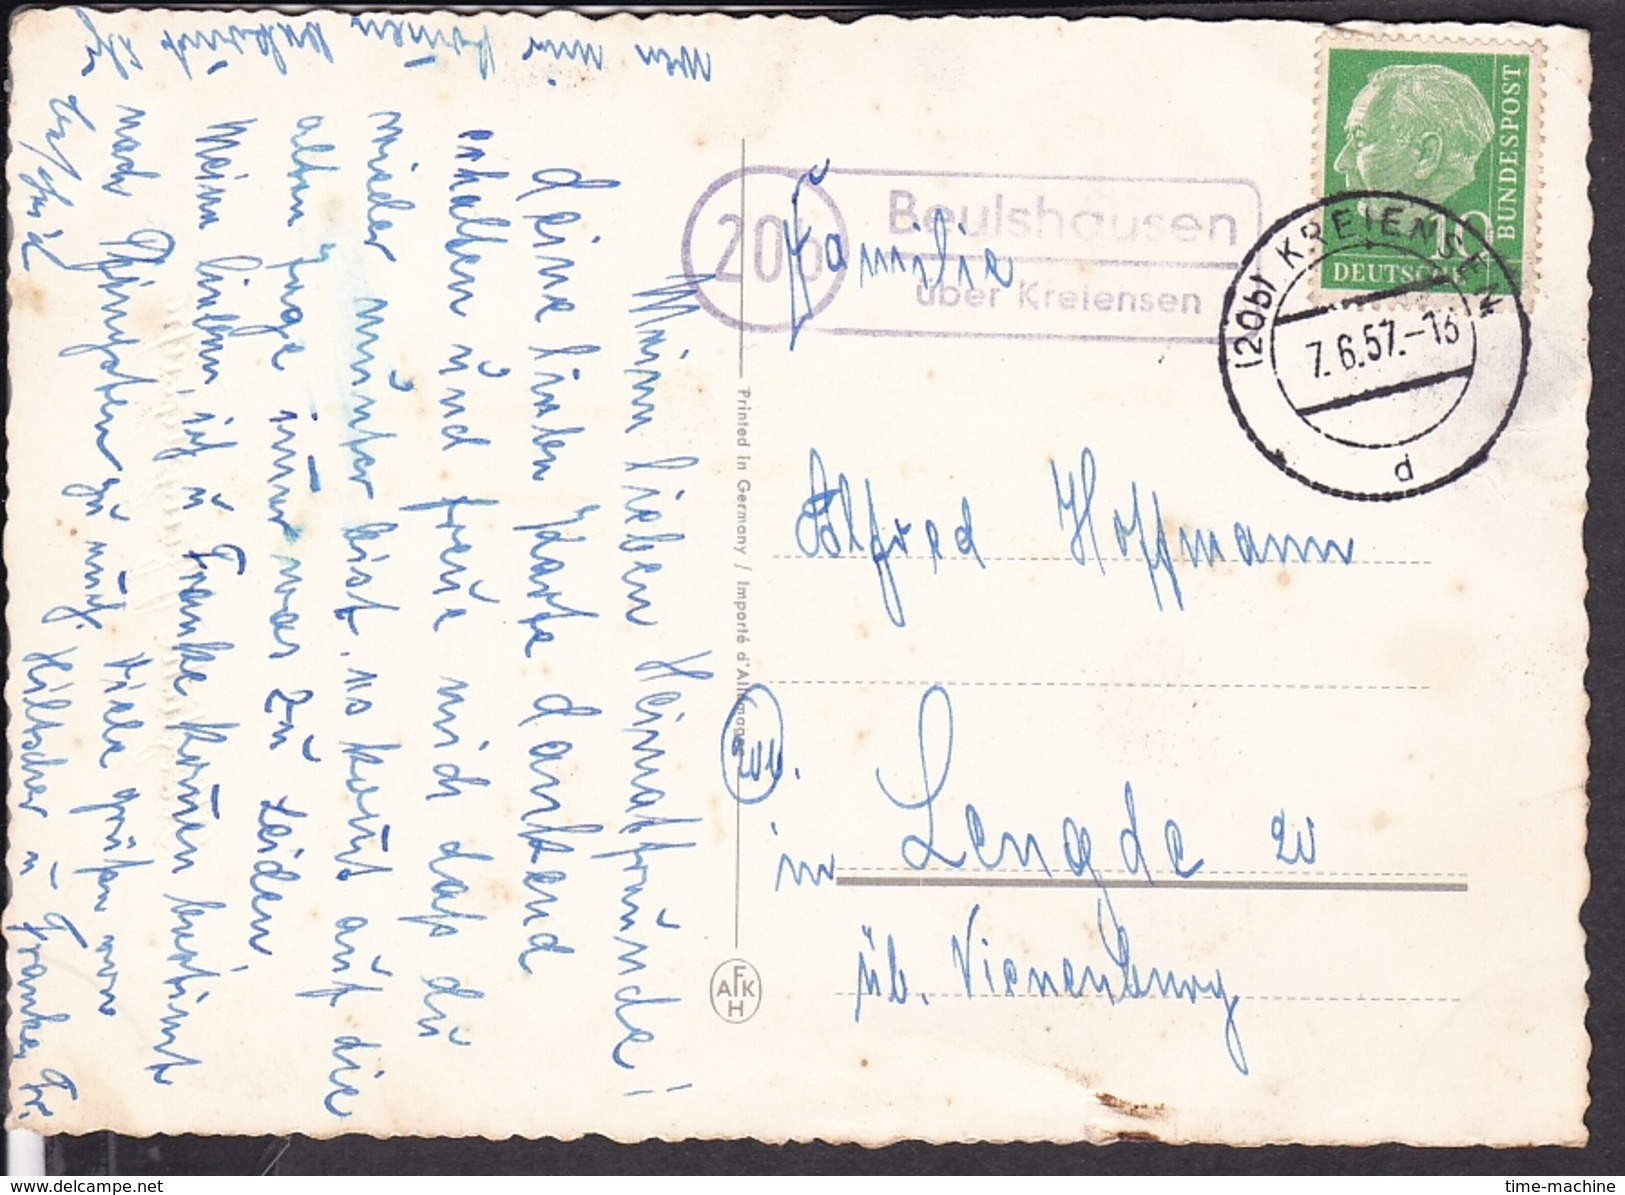 "Postkarte Pfingsten , Verlag AFKH ( Krüger ) Landpoststempel "" Beulshausen über Kreiensen "" 1957 - Pfingsten"